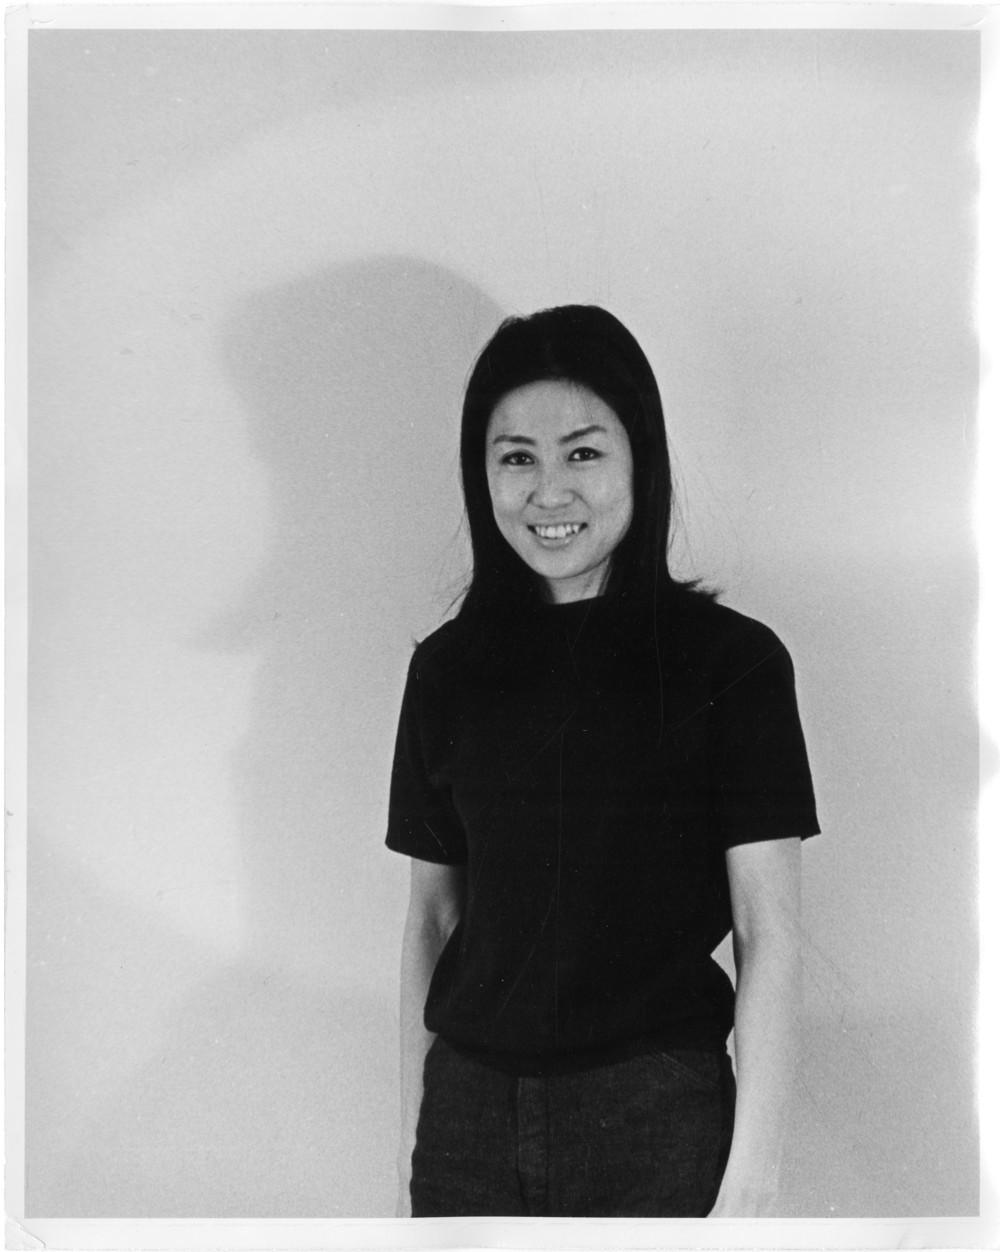 In graduate school, 1970s